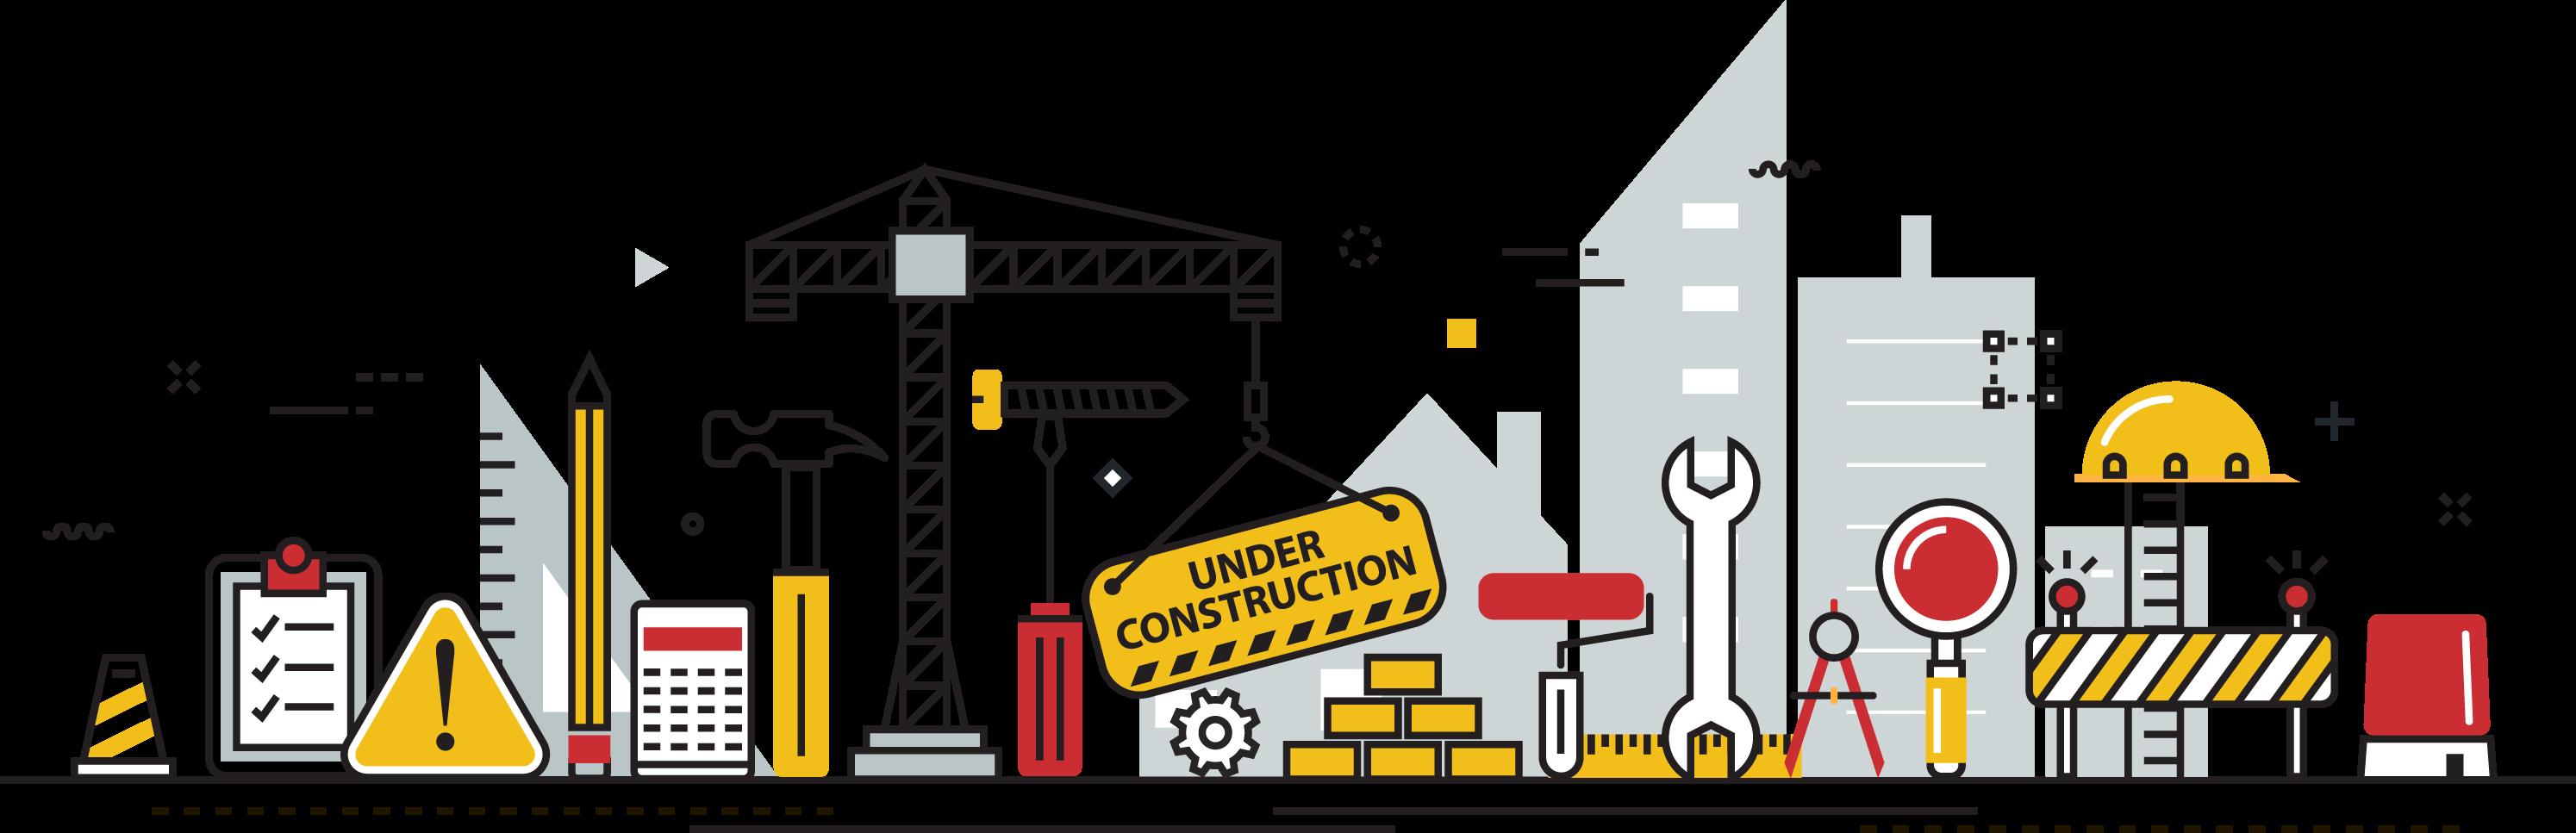 Under Construction (DX)